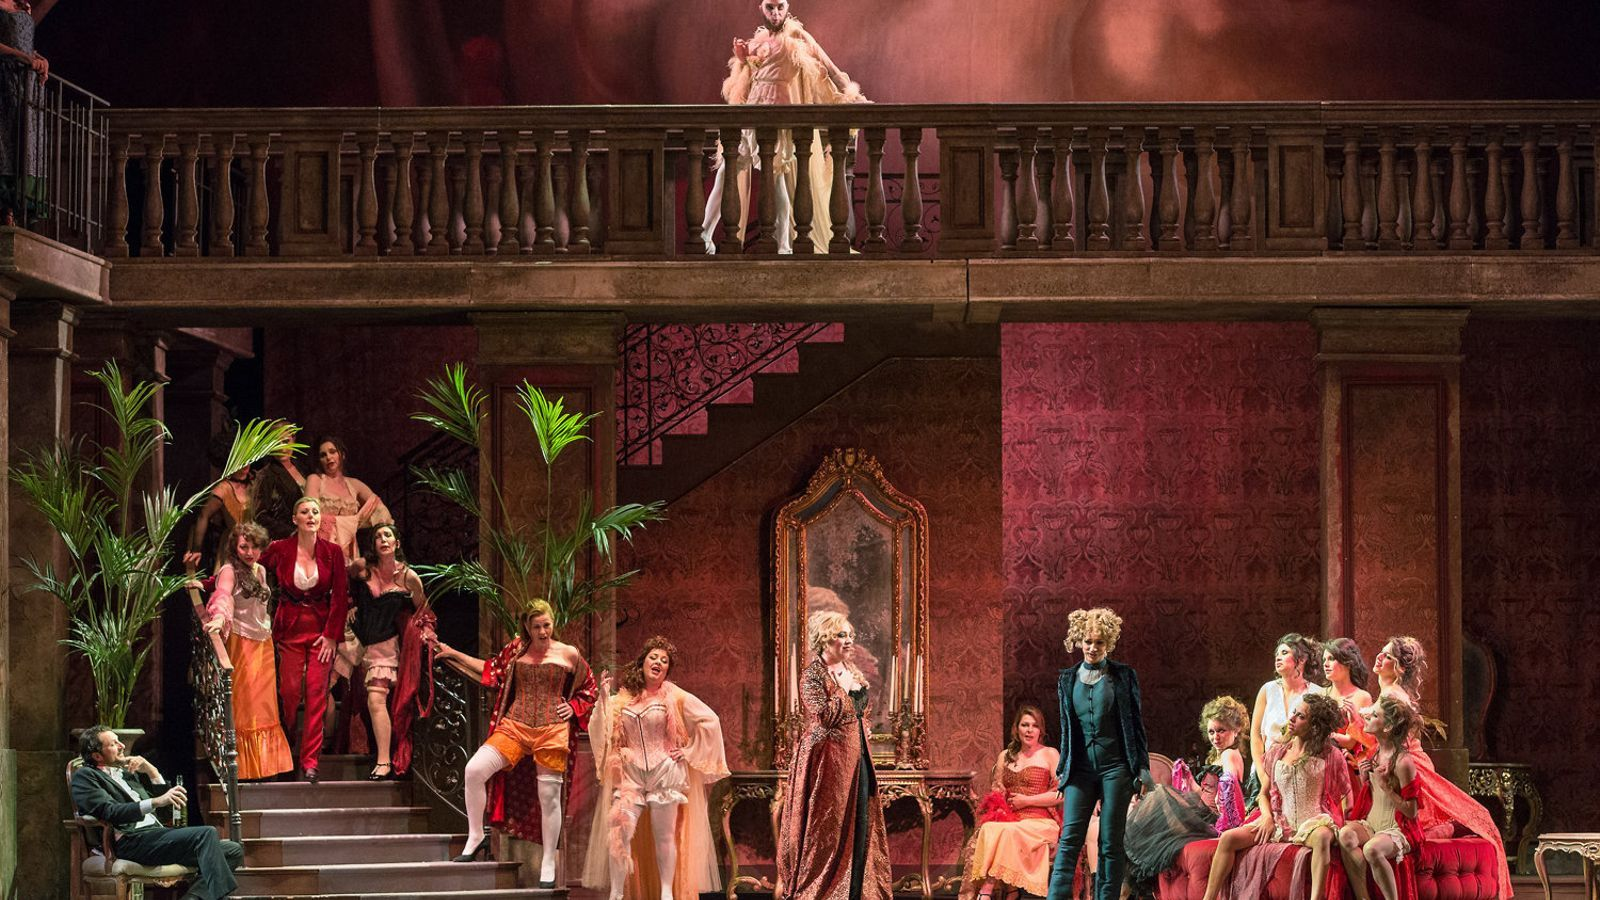 manon dessay villazon liceu Massenet - manon | for their first-ever encounter in a staged opera, natalie dessay as manon and rolando villazón as des grieux were the much-awaited highl.